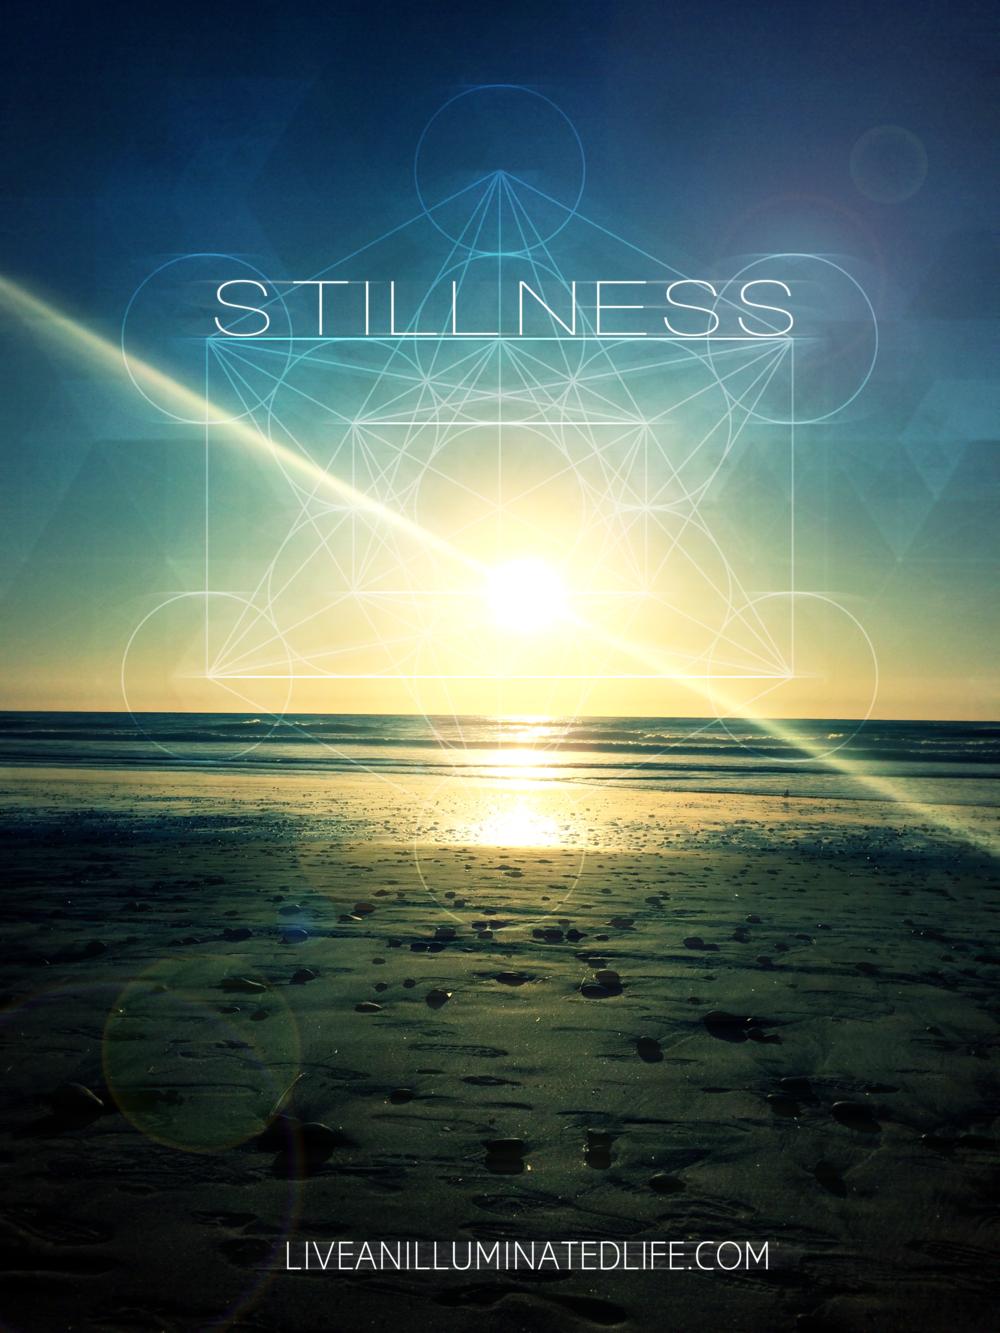 Stilliness by Belinda Pearl